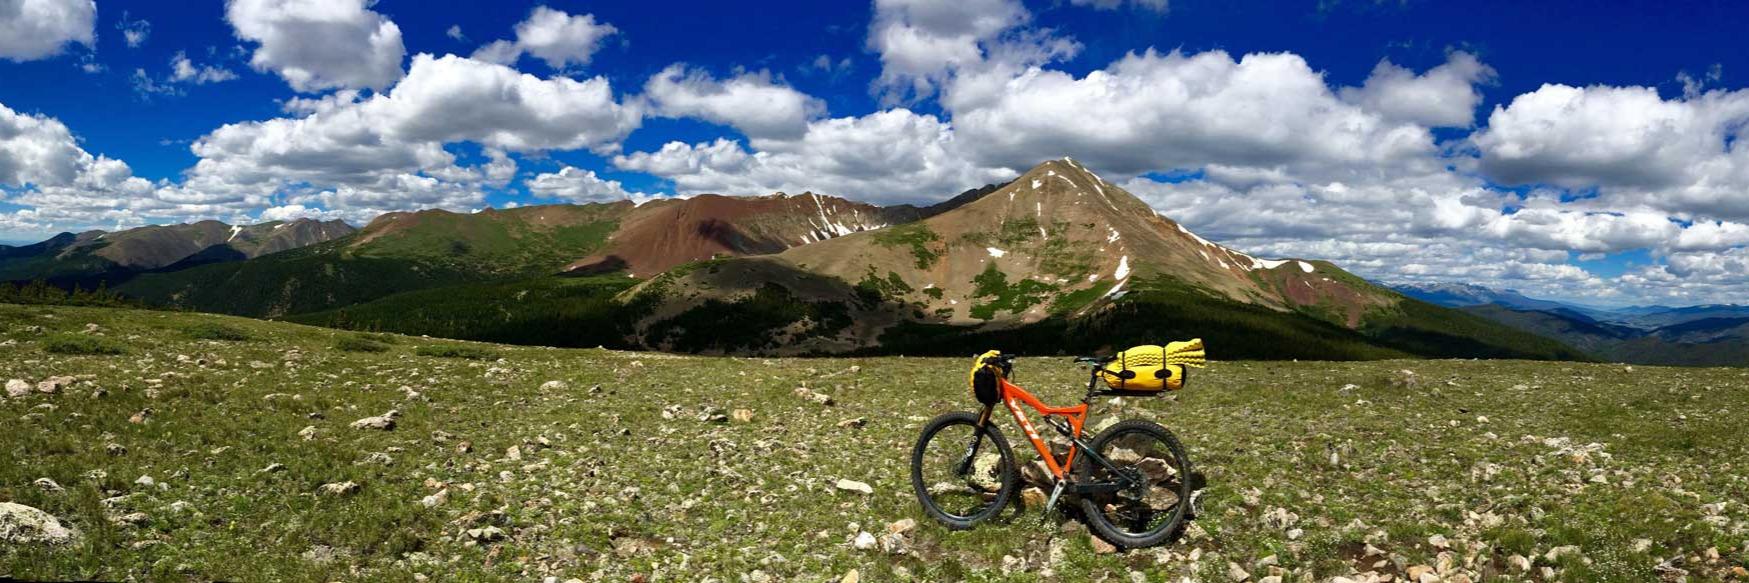 bike in a field with mountain backdrop